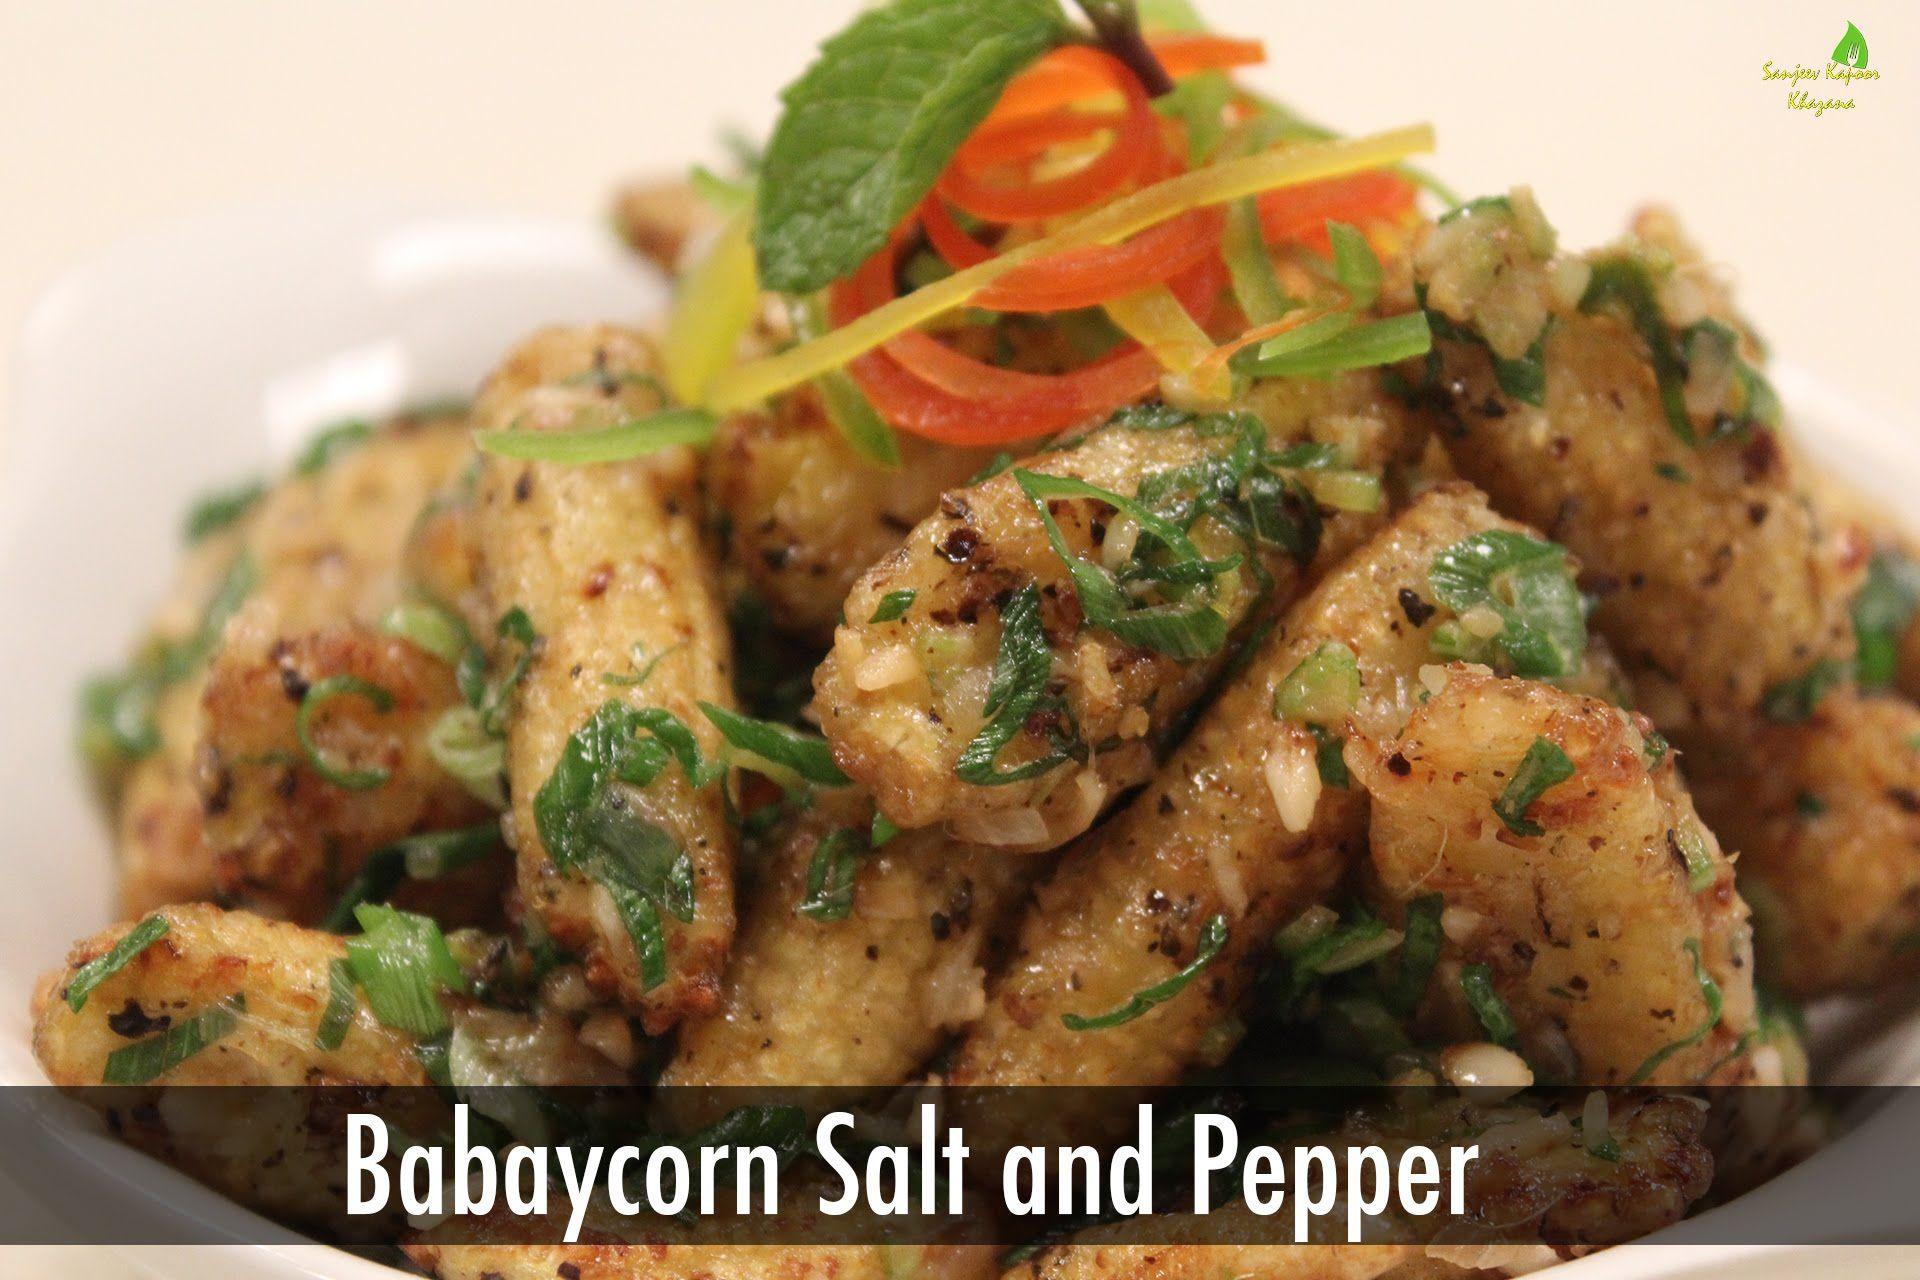 Baby corn salt pepper sanjeev kapoor khazana starters food baby corn salt pepper sanjeev kapoor khazana forumfinder Gallery